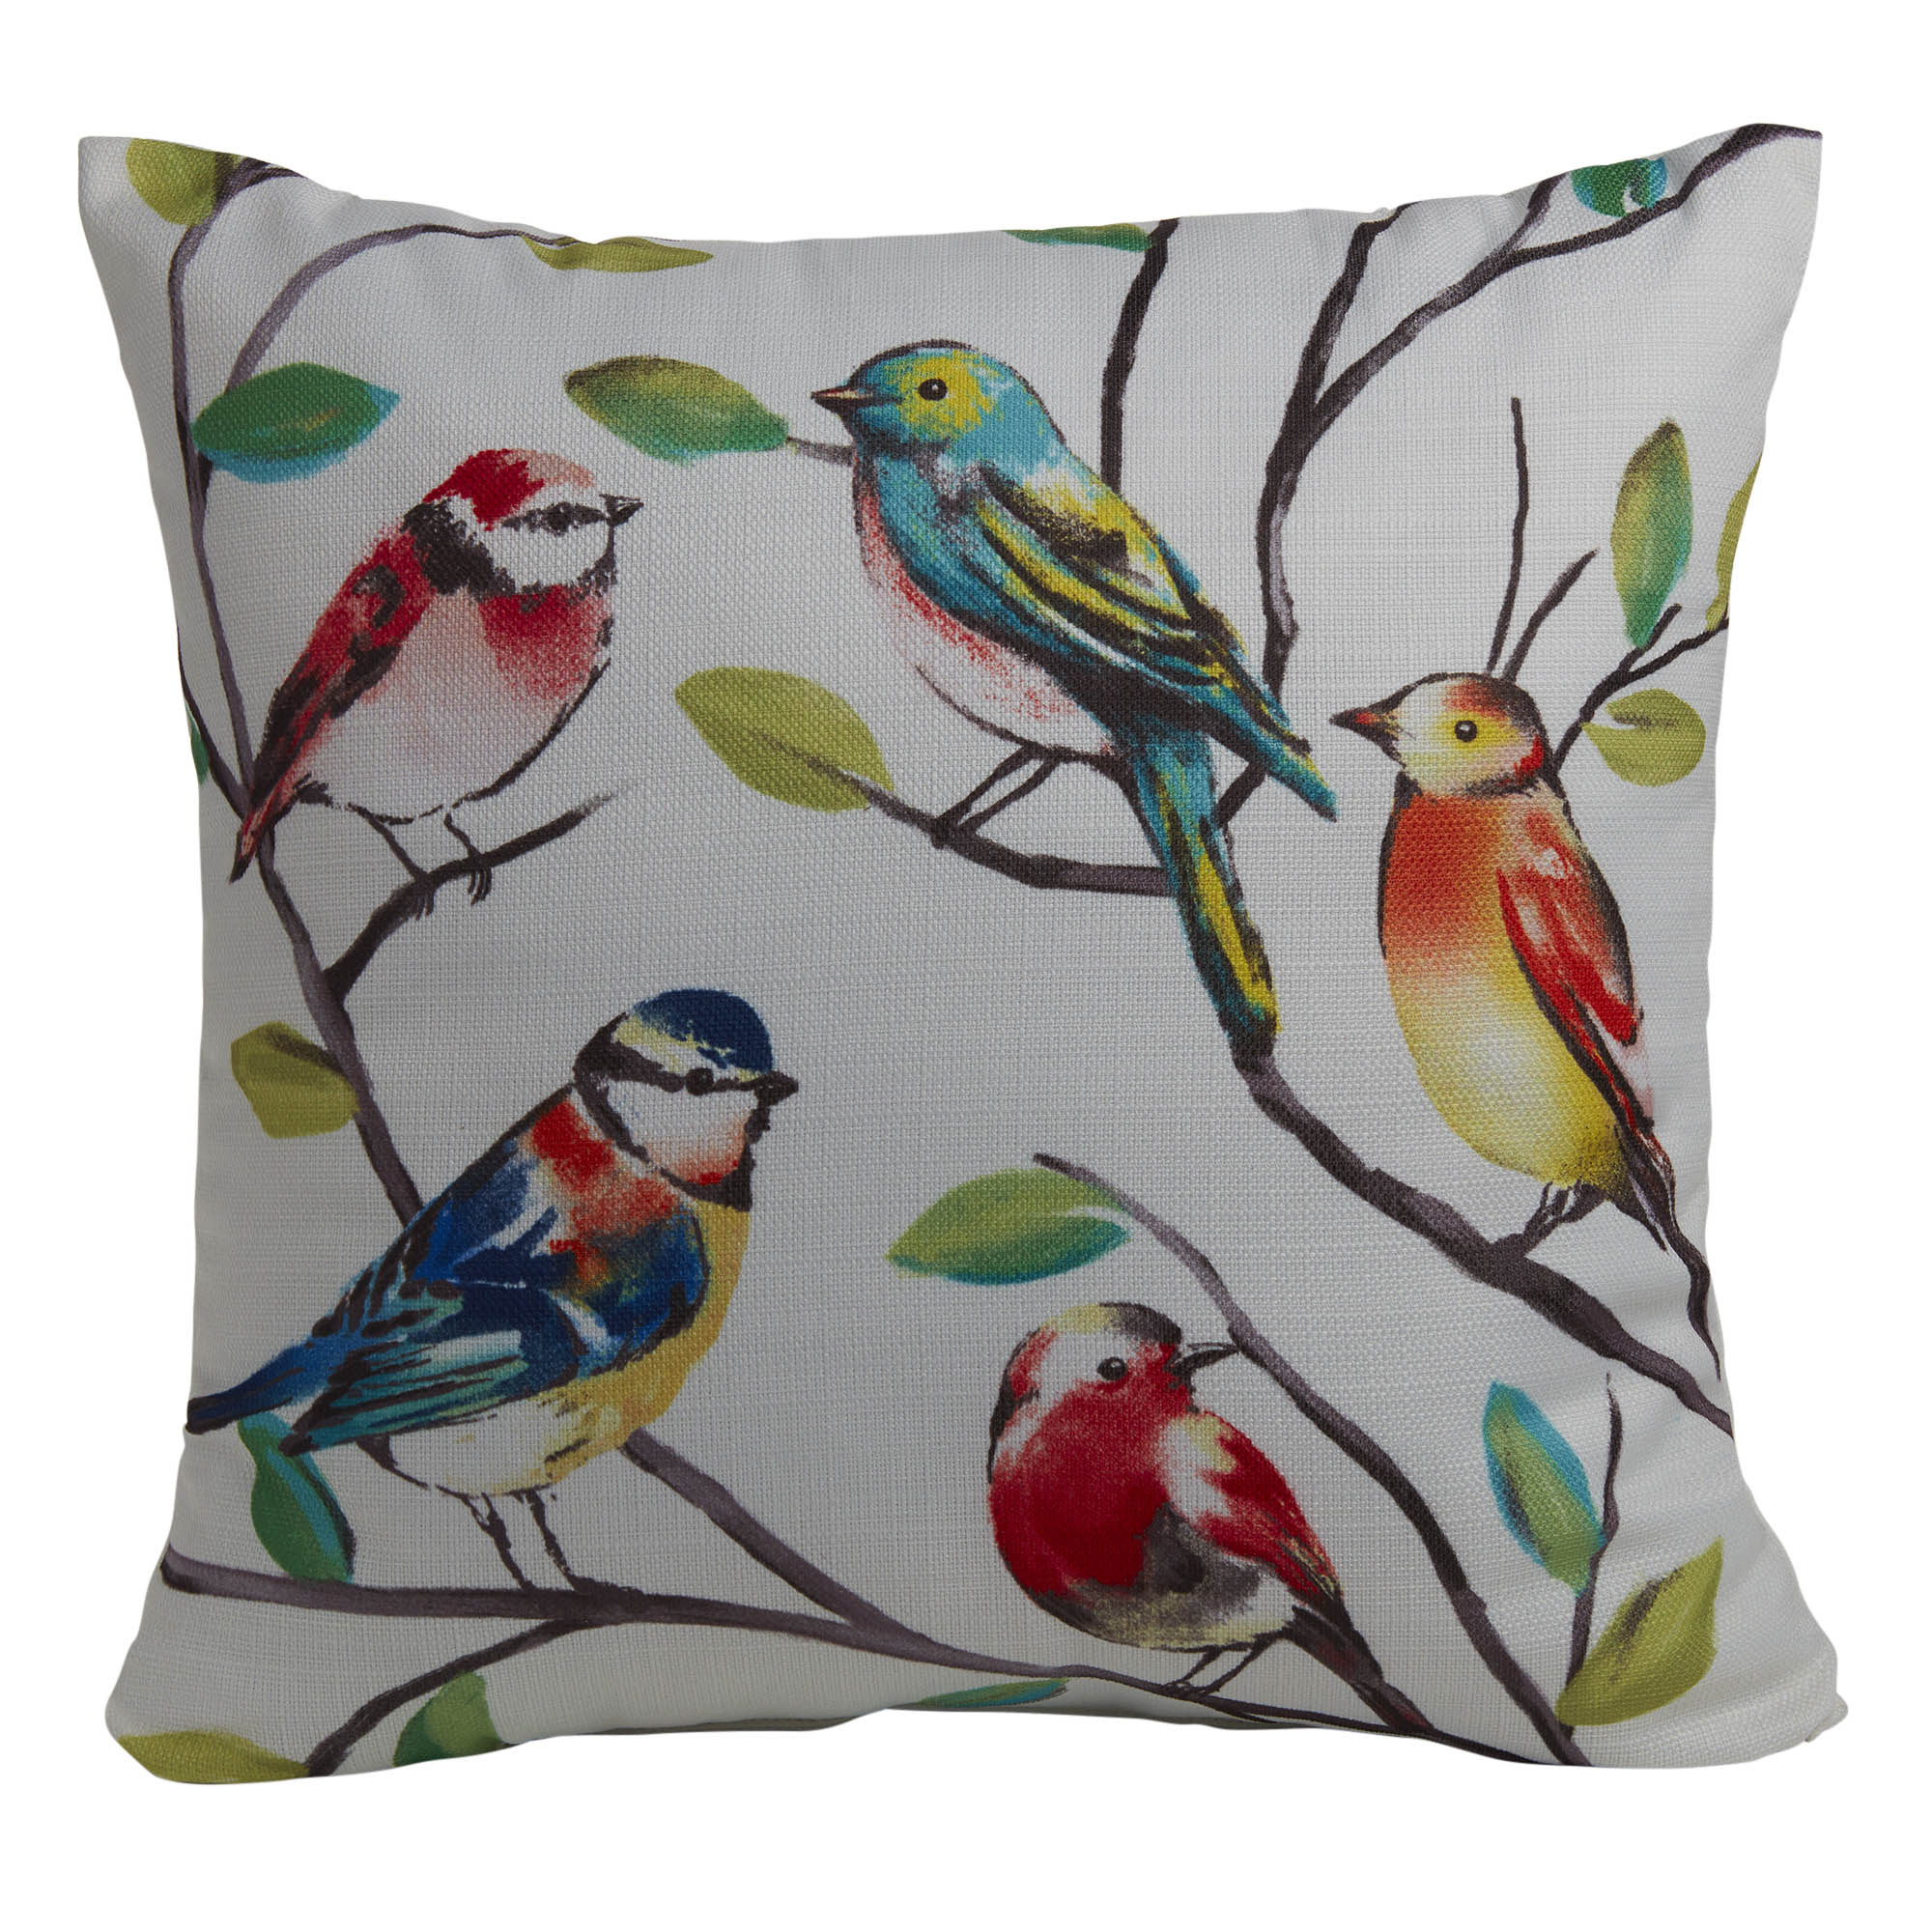 mainstays bird decorative throw pillow multicolored 18 x 18 walmart com